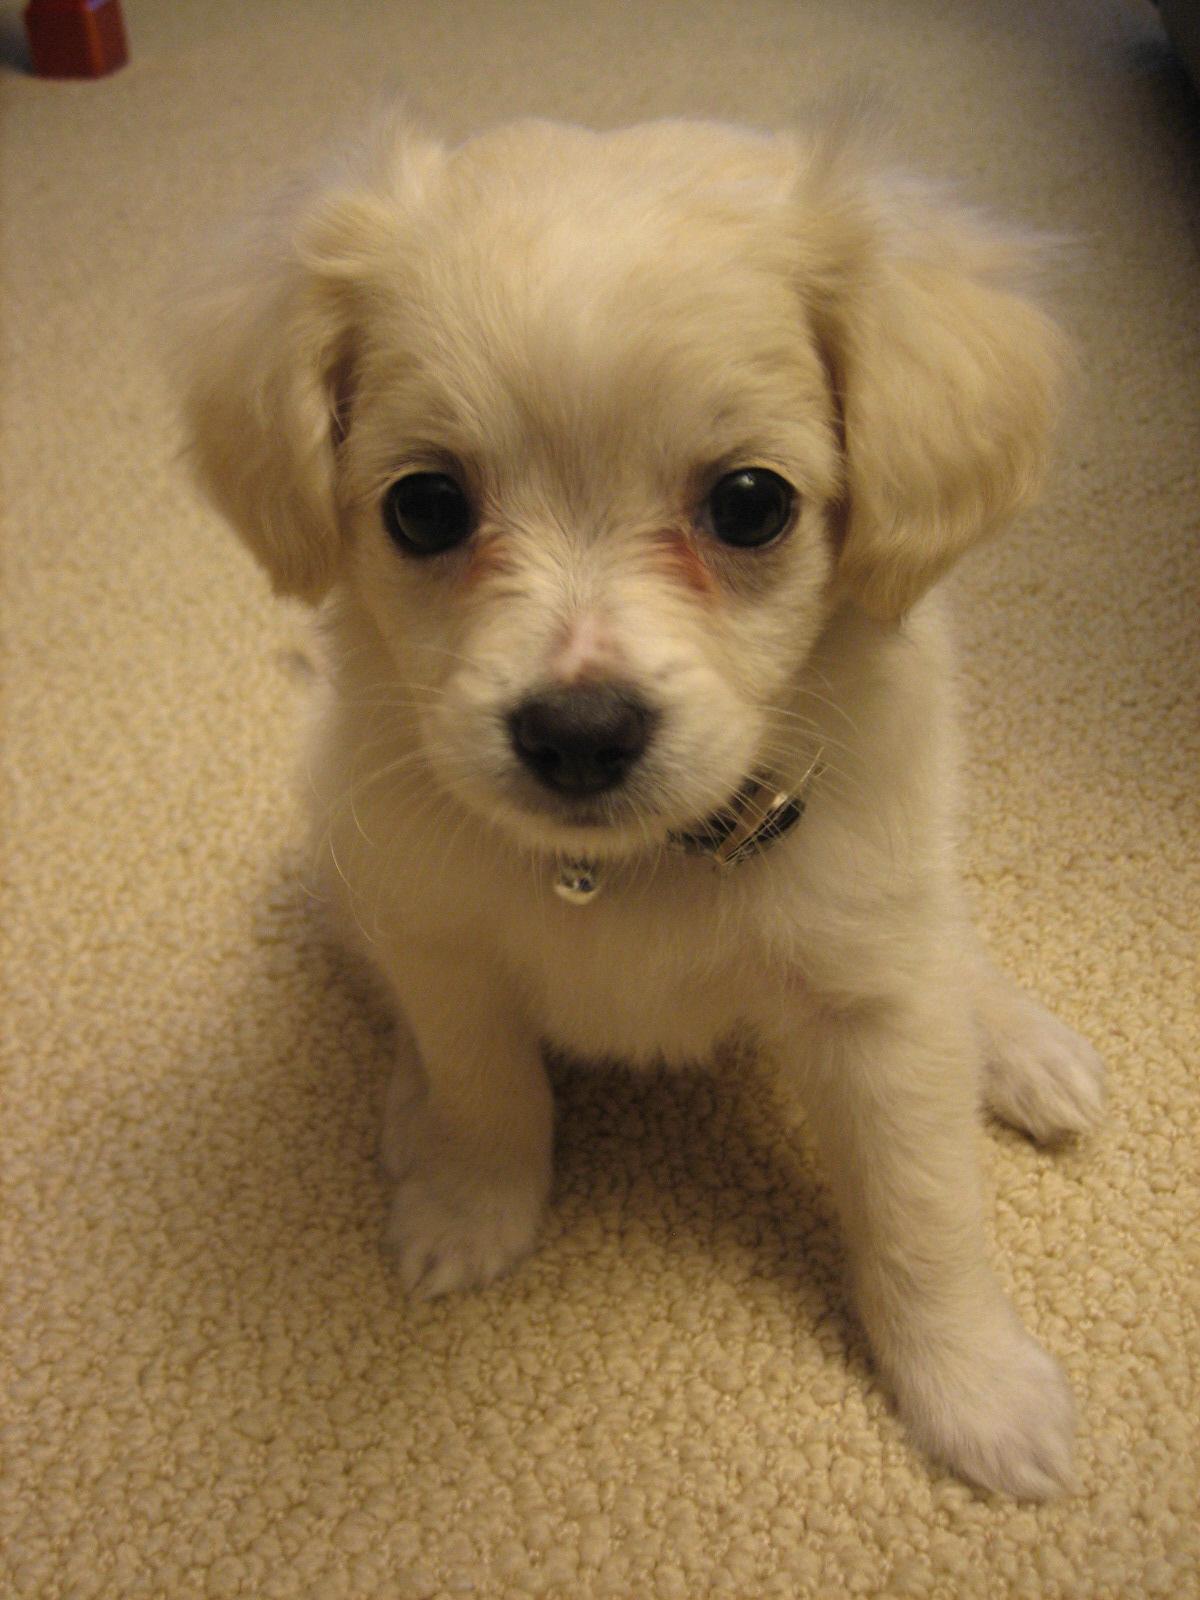 File:Meet Truffle!.jpg - Wikimedia Commons